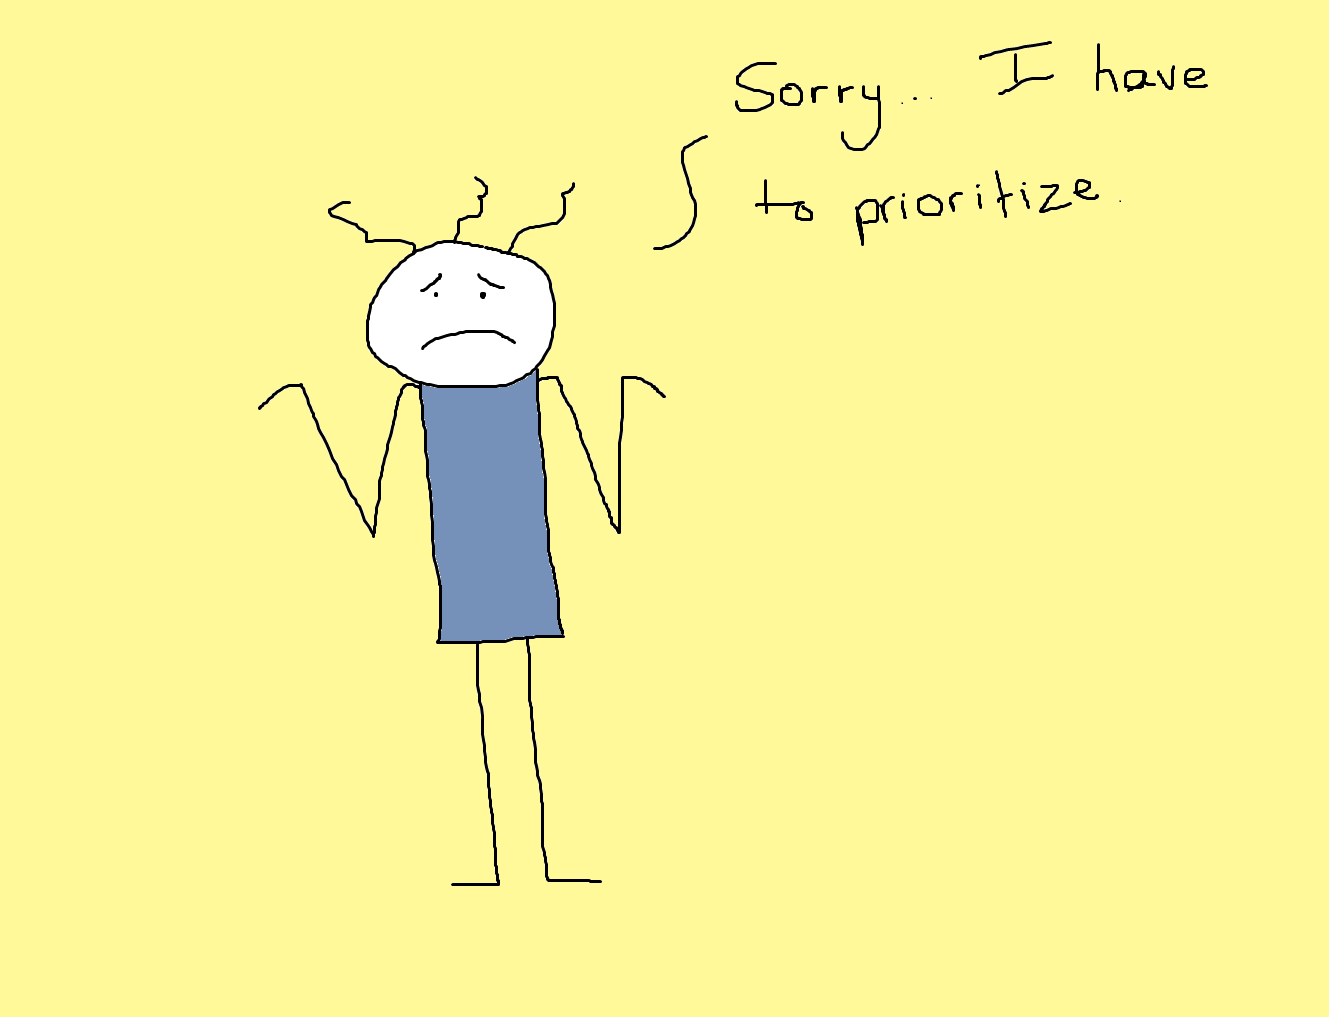 /limit-pip-promises-in-progress-d77774802bbd feature image